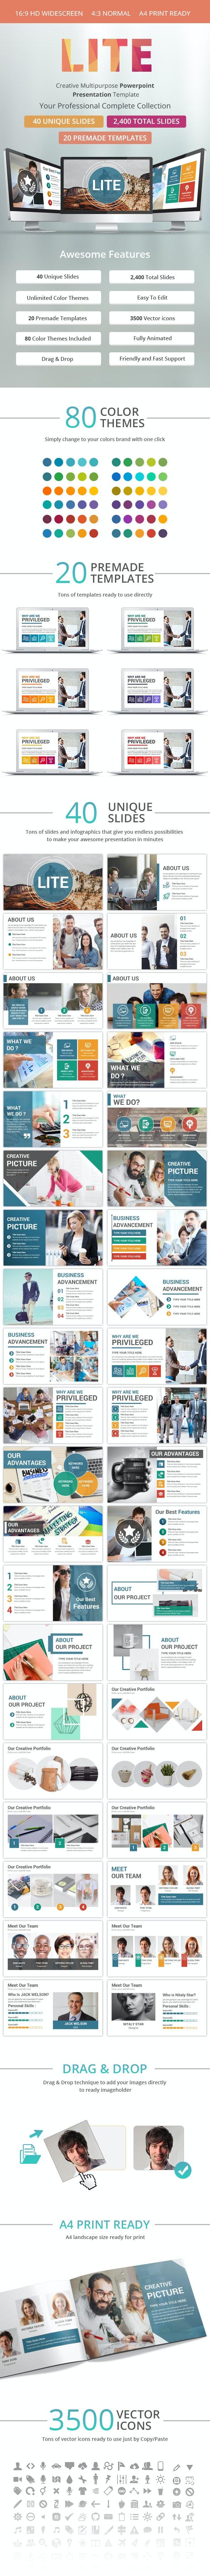 Lite PowerPoint Presentation Template - Business PowerPoint Templates